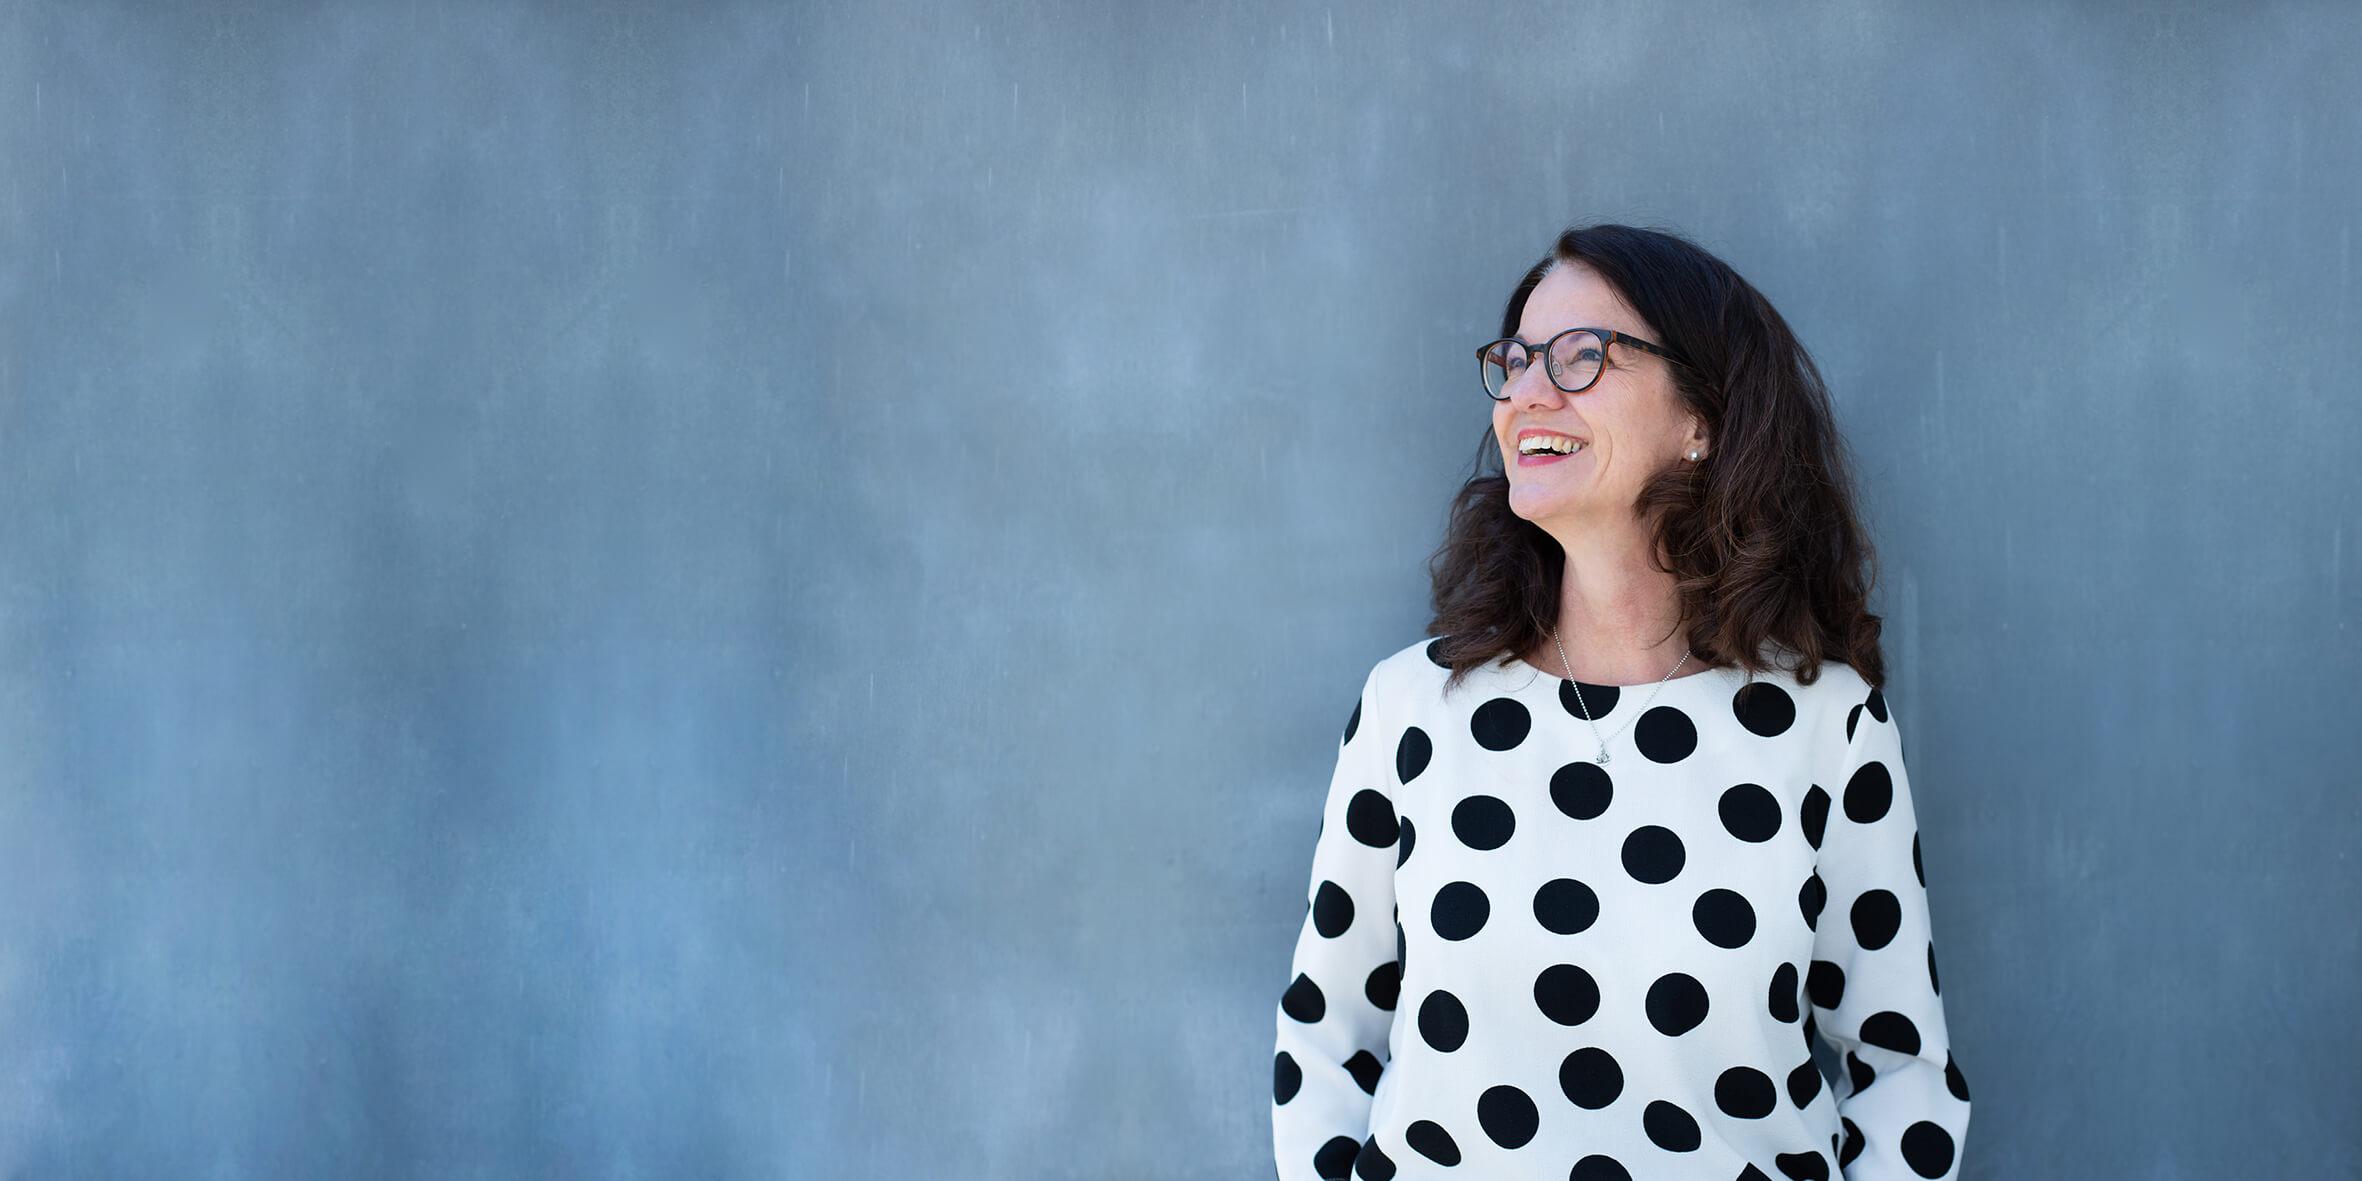 lächelnde Frau – Portraitshooting